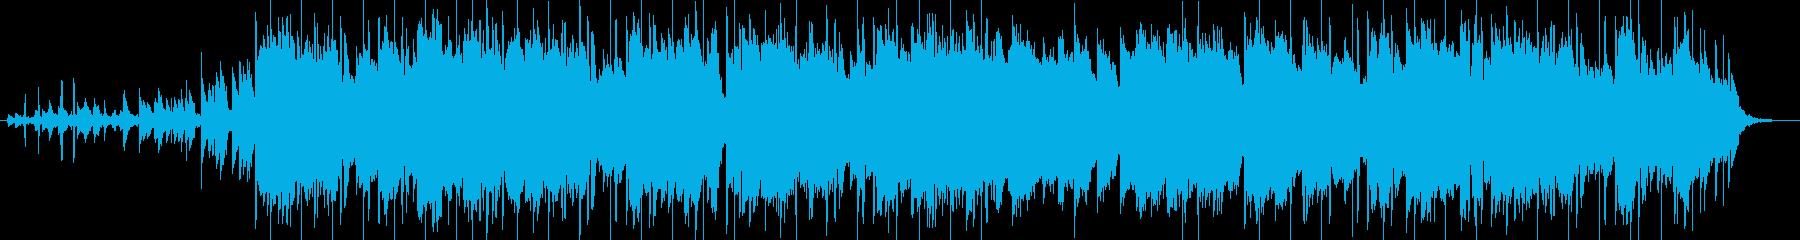 Lofi Hiphop/レトロカフェ系 の再生済みの波形